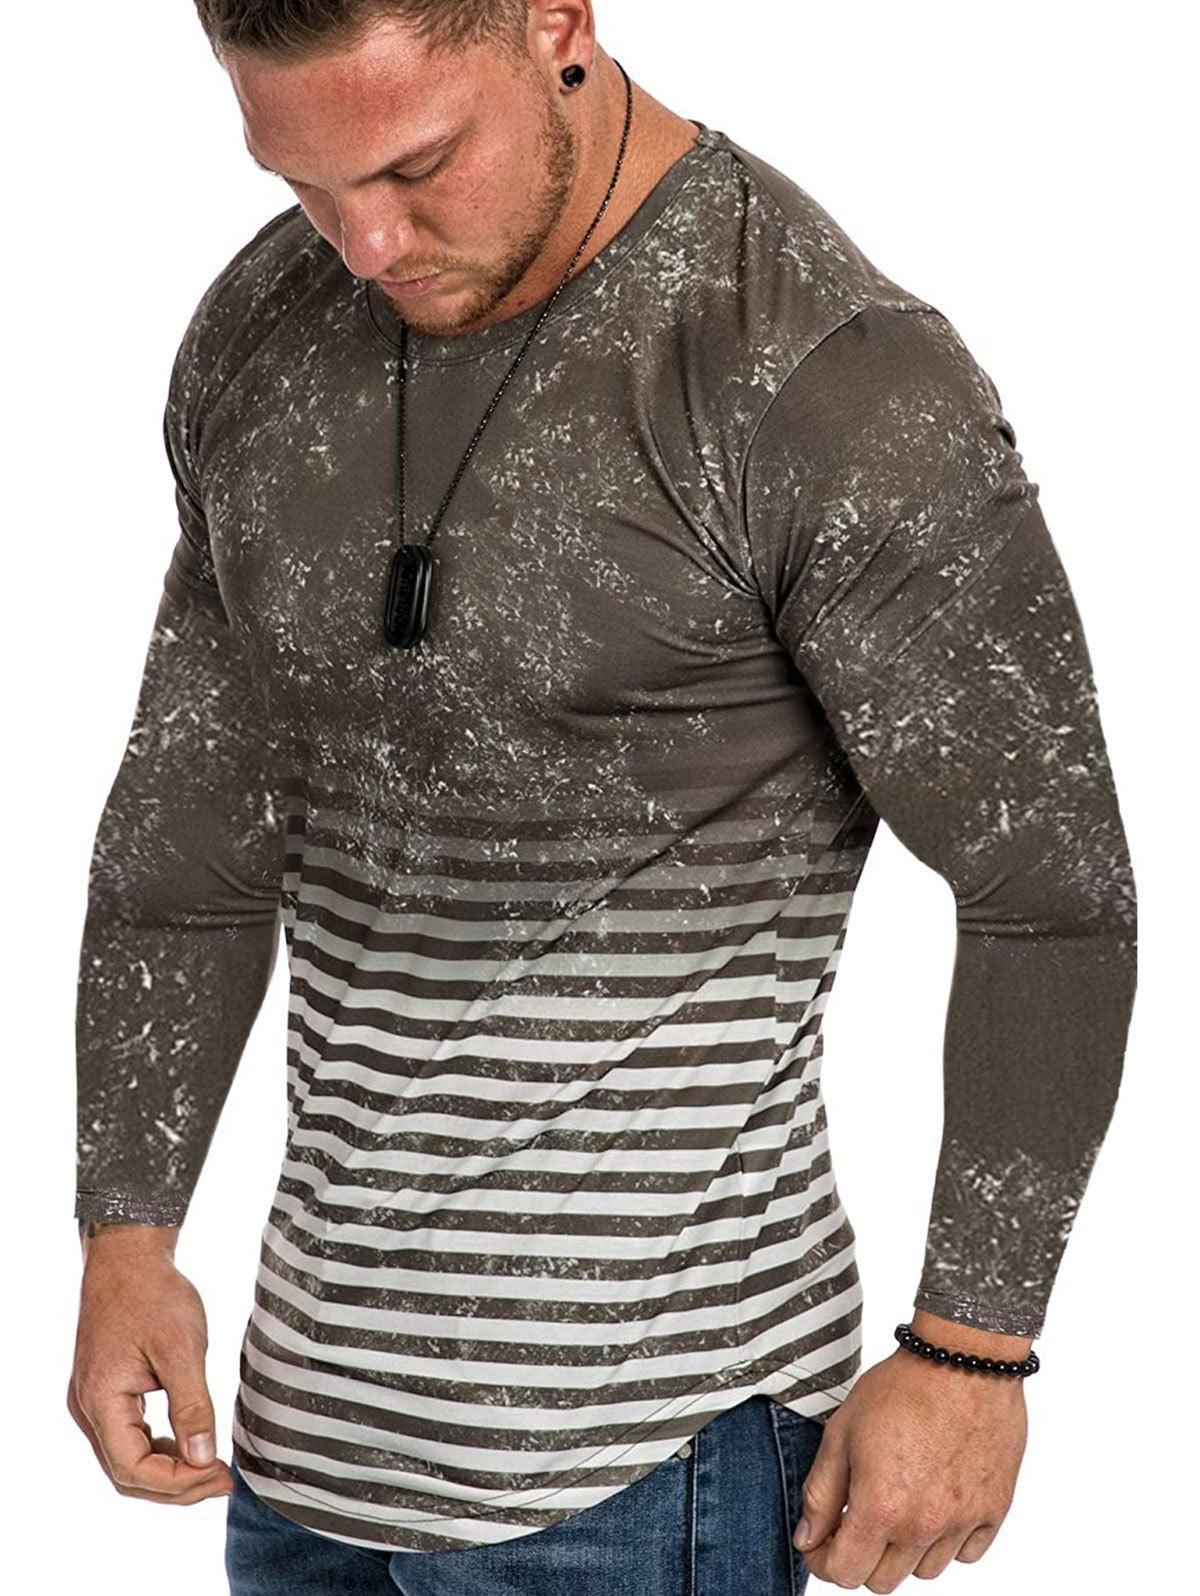 Striped Spot Ombre Print Curved Hem T-shirt